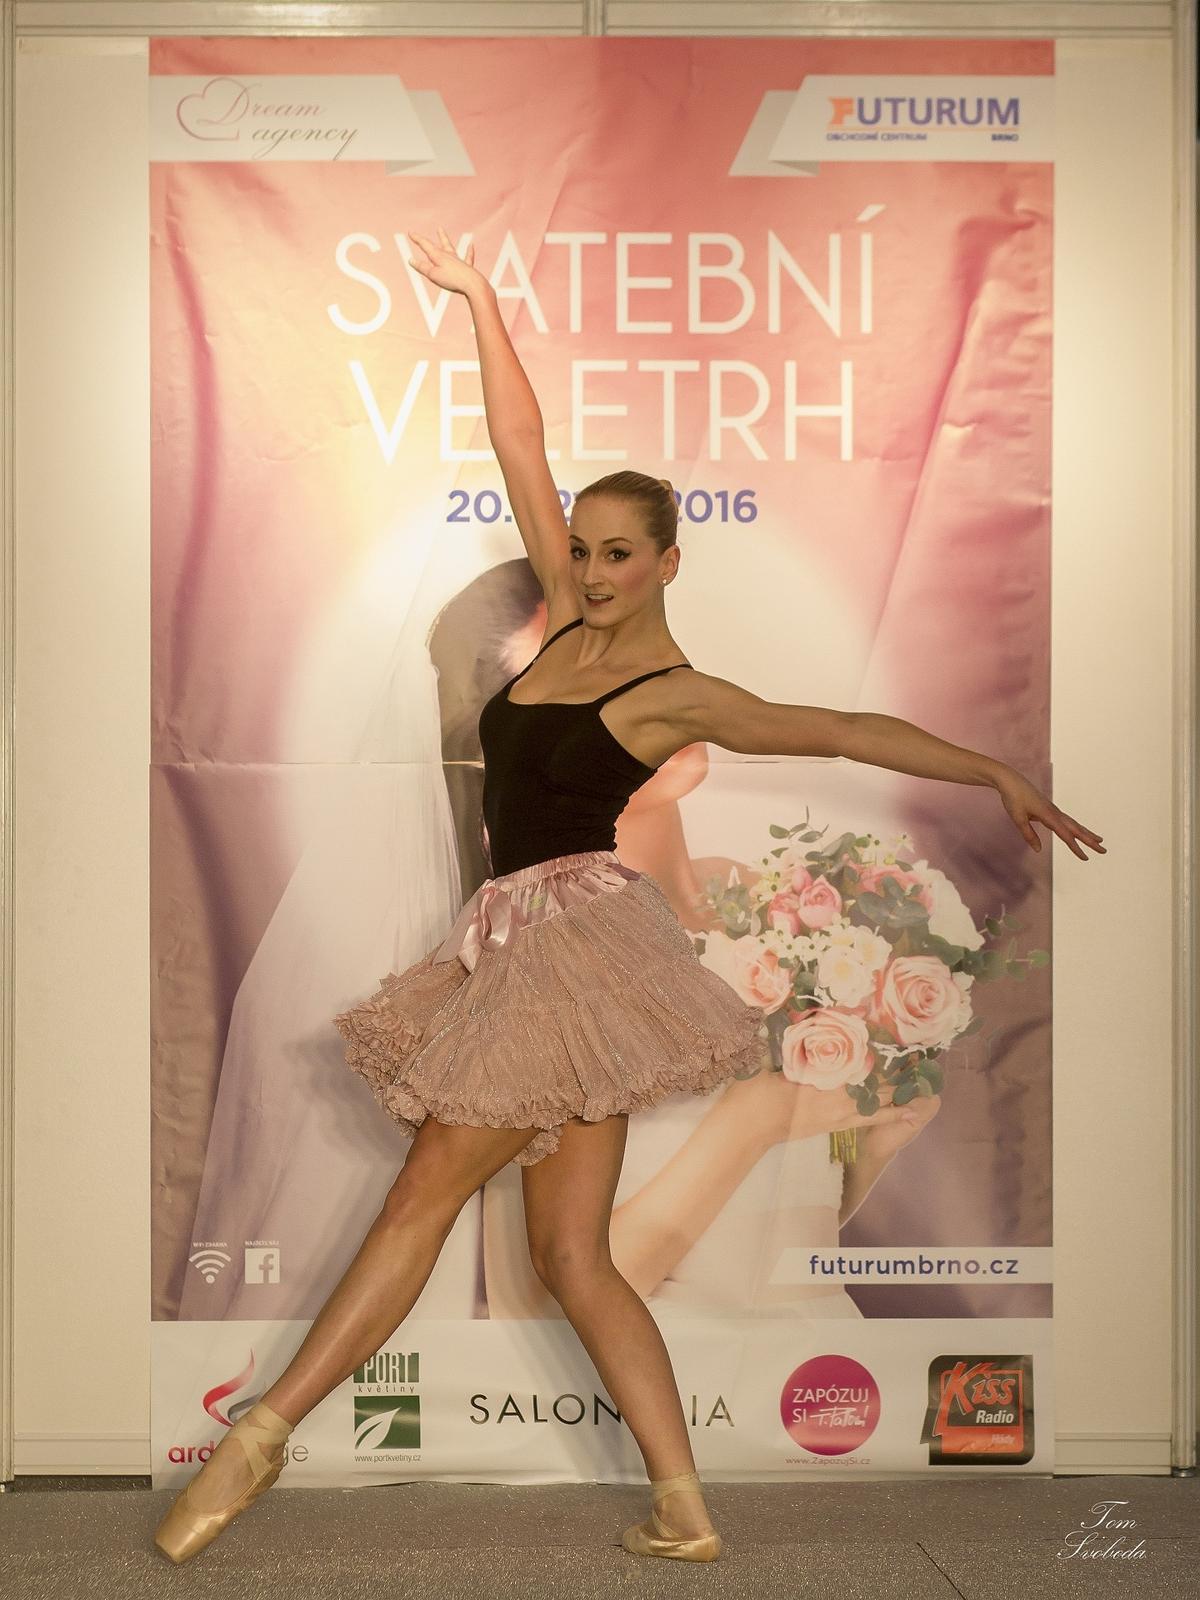 Svatební veletrh Futurum Brno - Obrázek č. 2